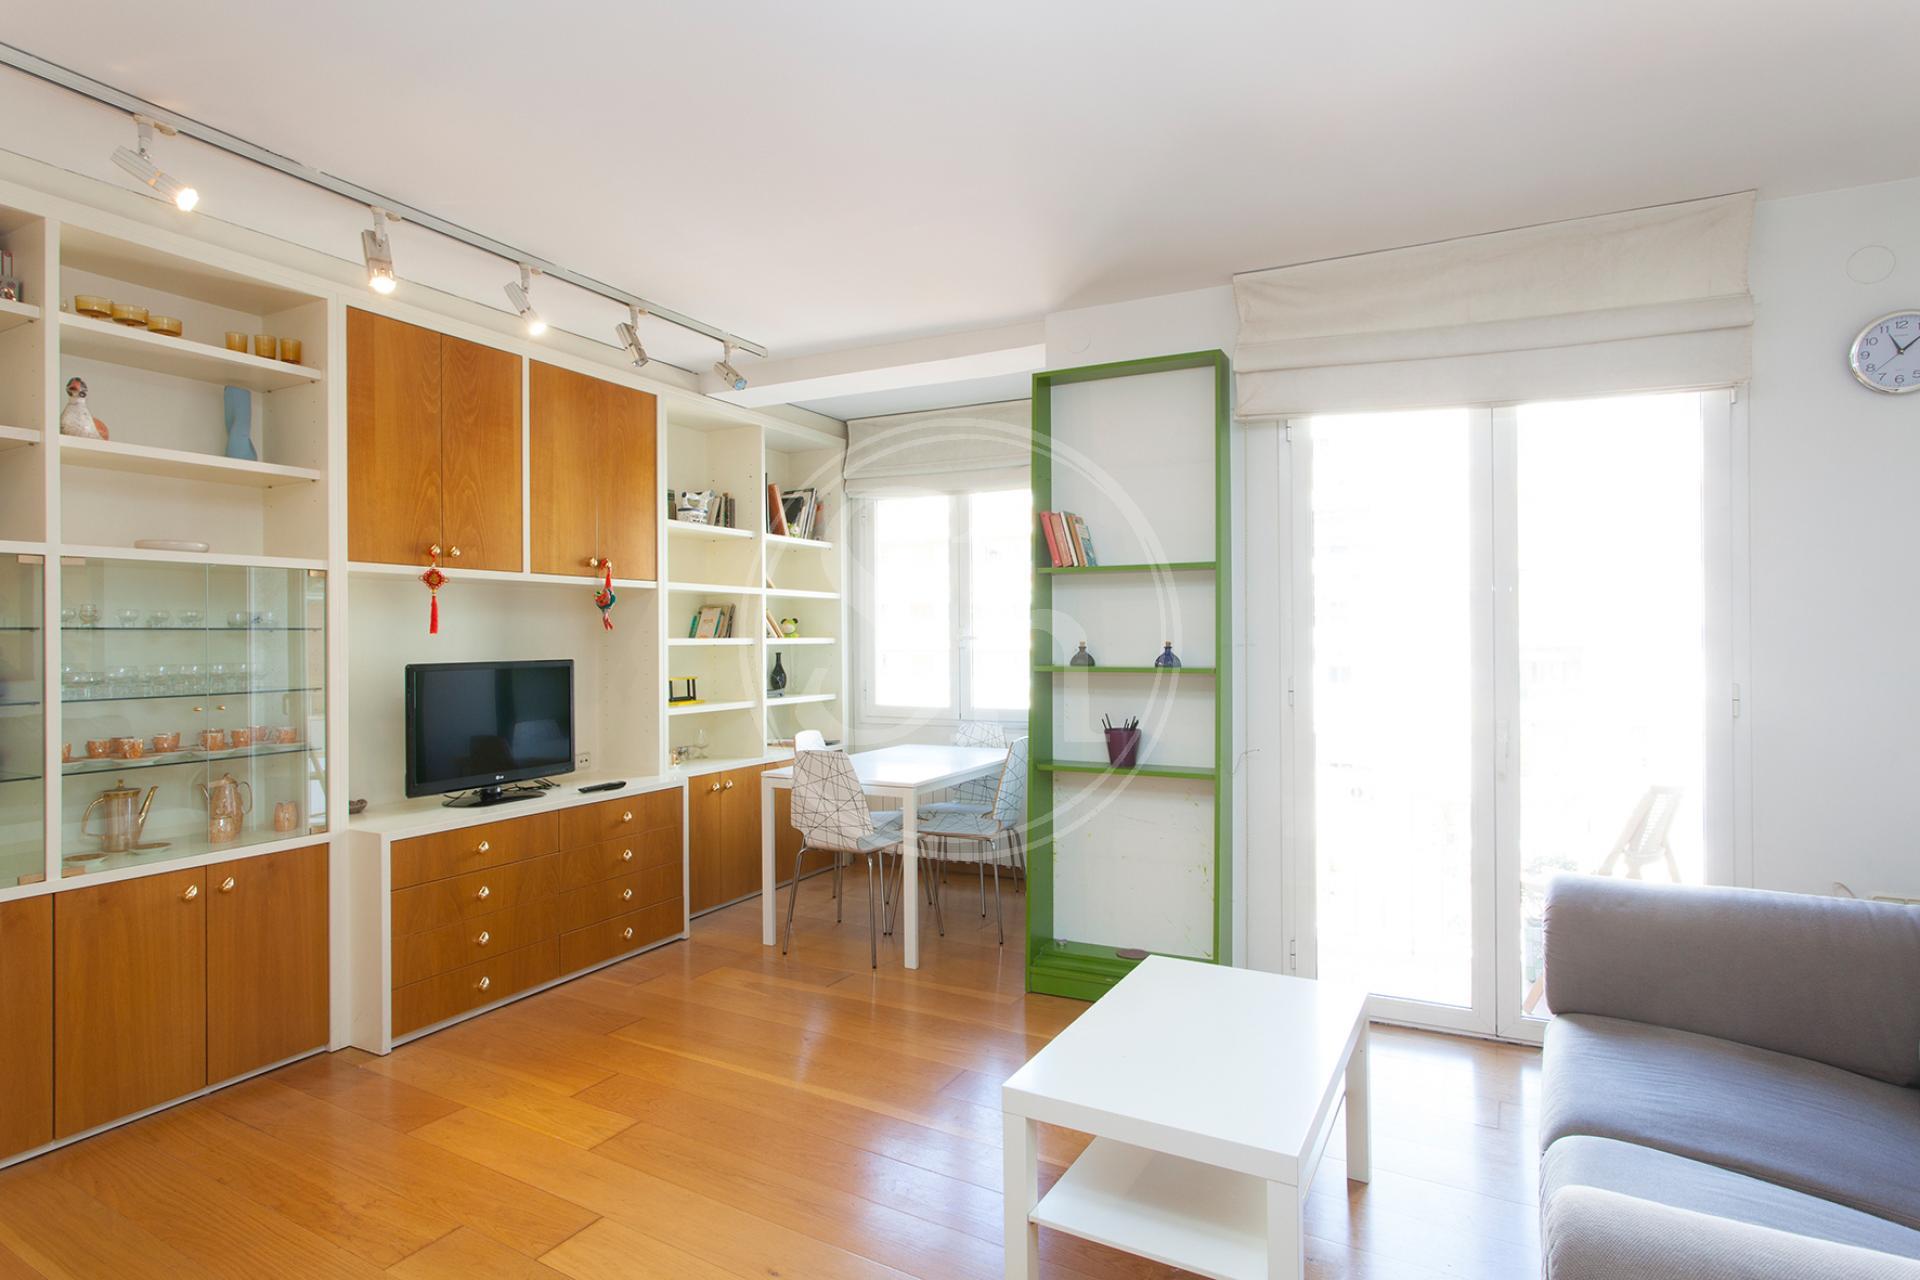 shbarcelona alquiler piso familiar en sagrada familia. Black Bedroom Furniture Sets. Home Design Ideas